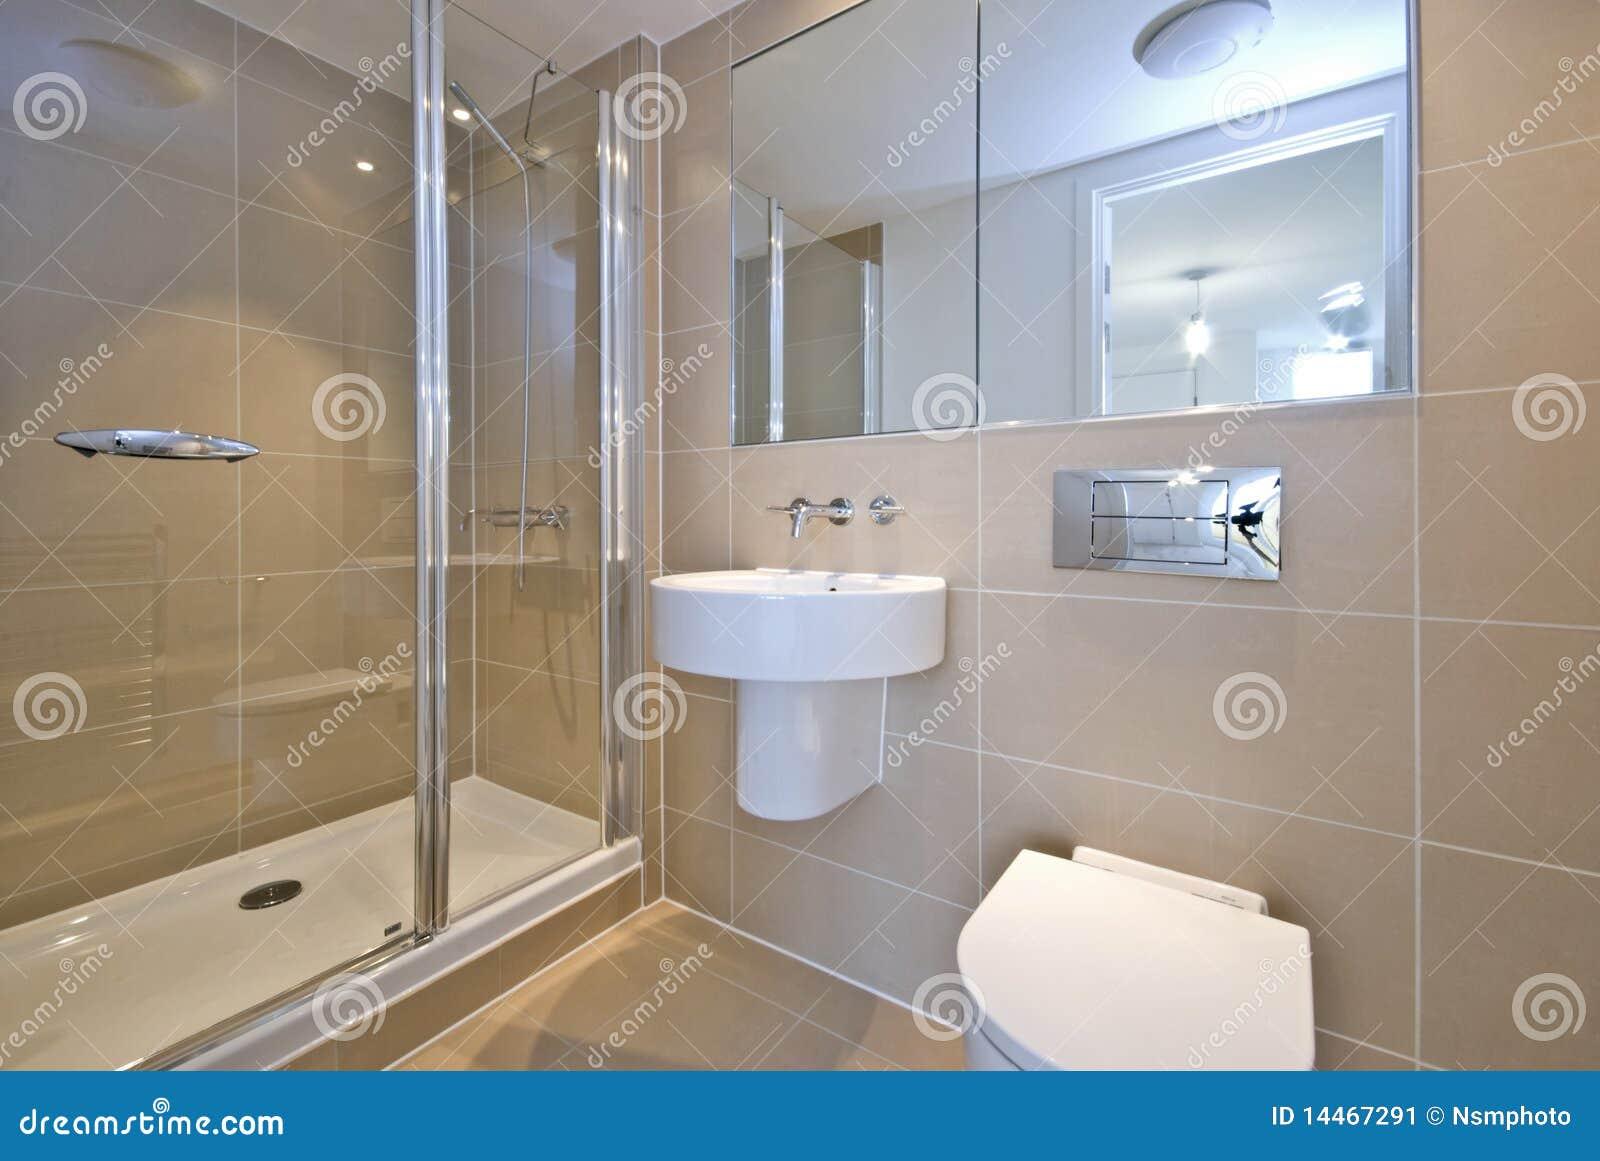 Moderne engels reeksbadkamers met douche stock afbeelding